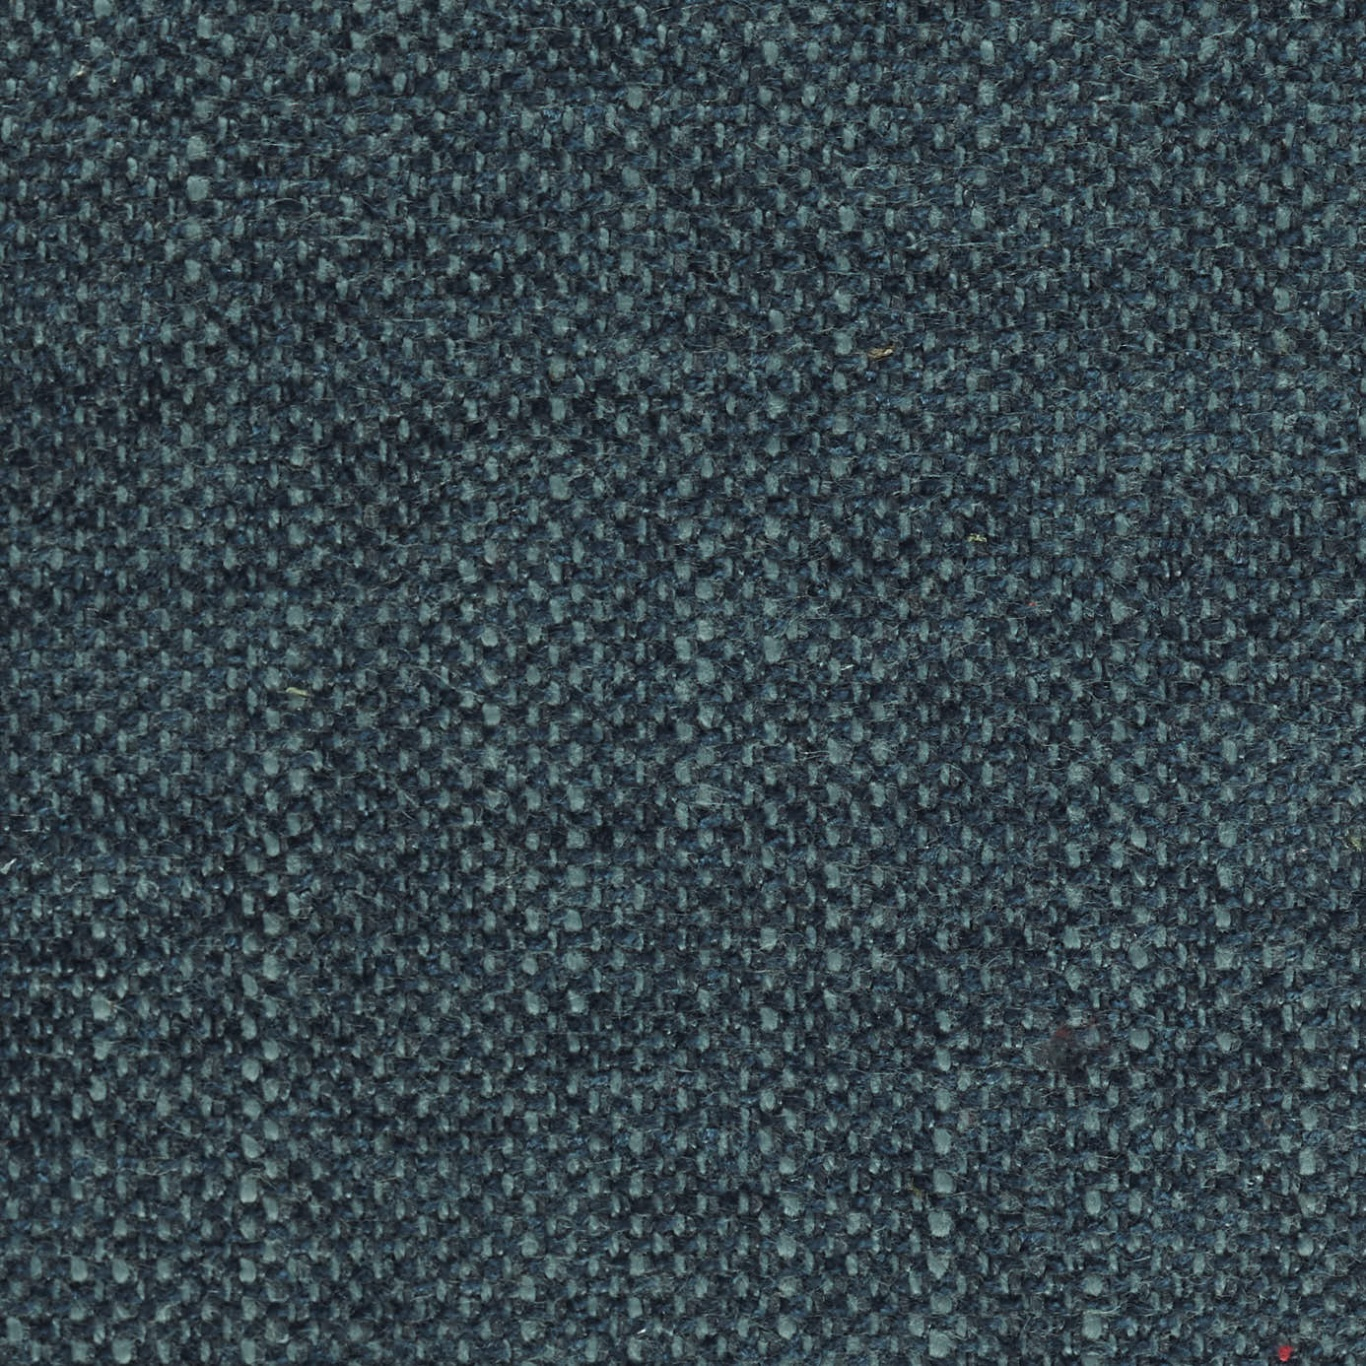 Image of Harlequin Molecule Moonlight Fabric 440208